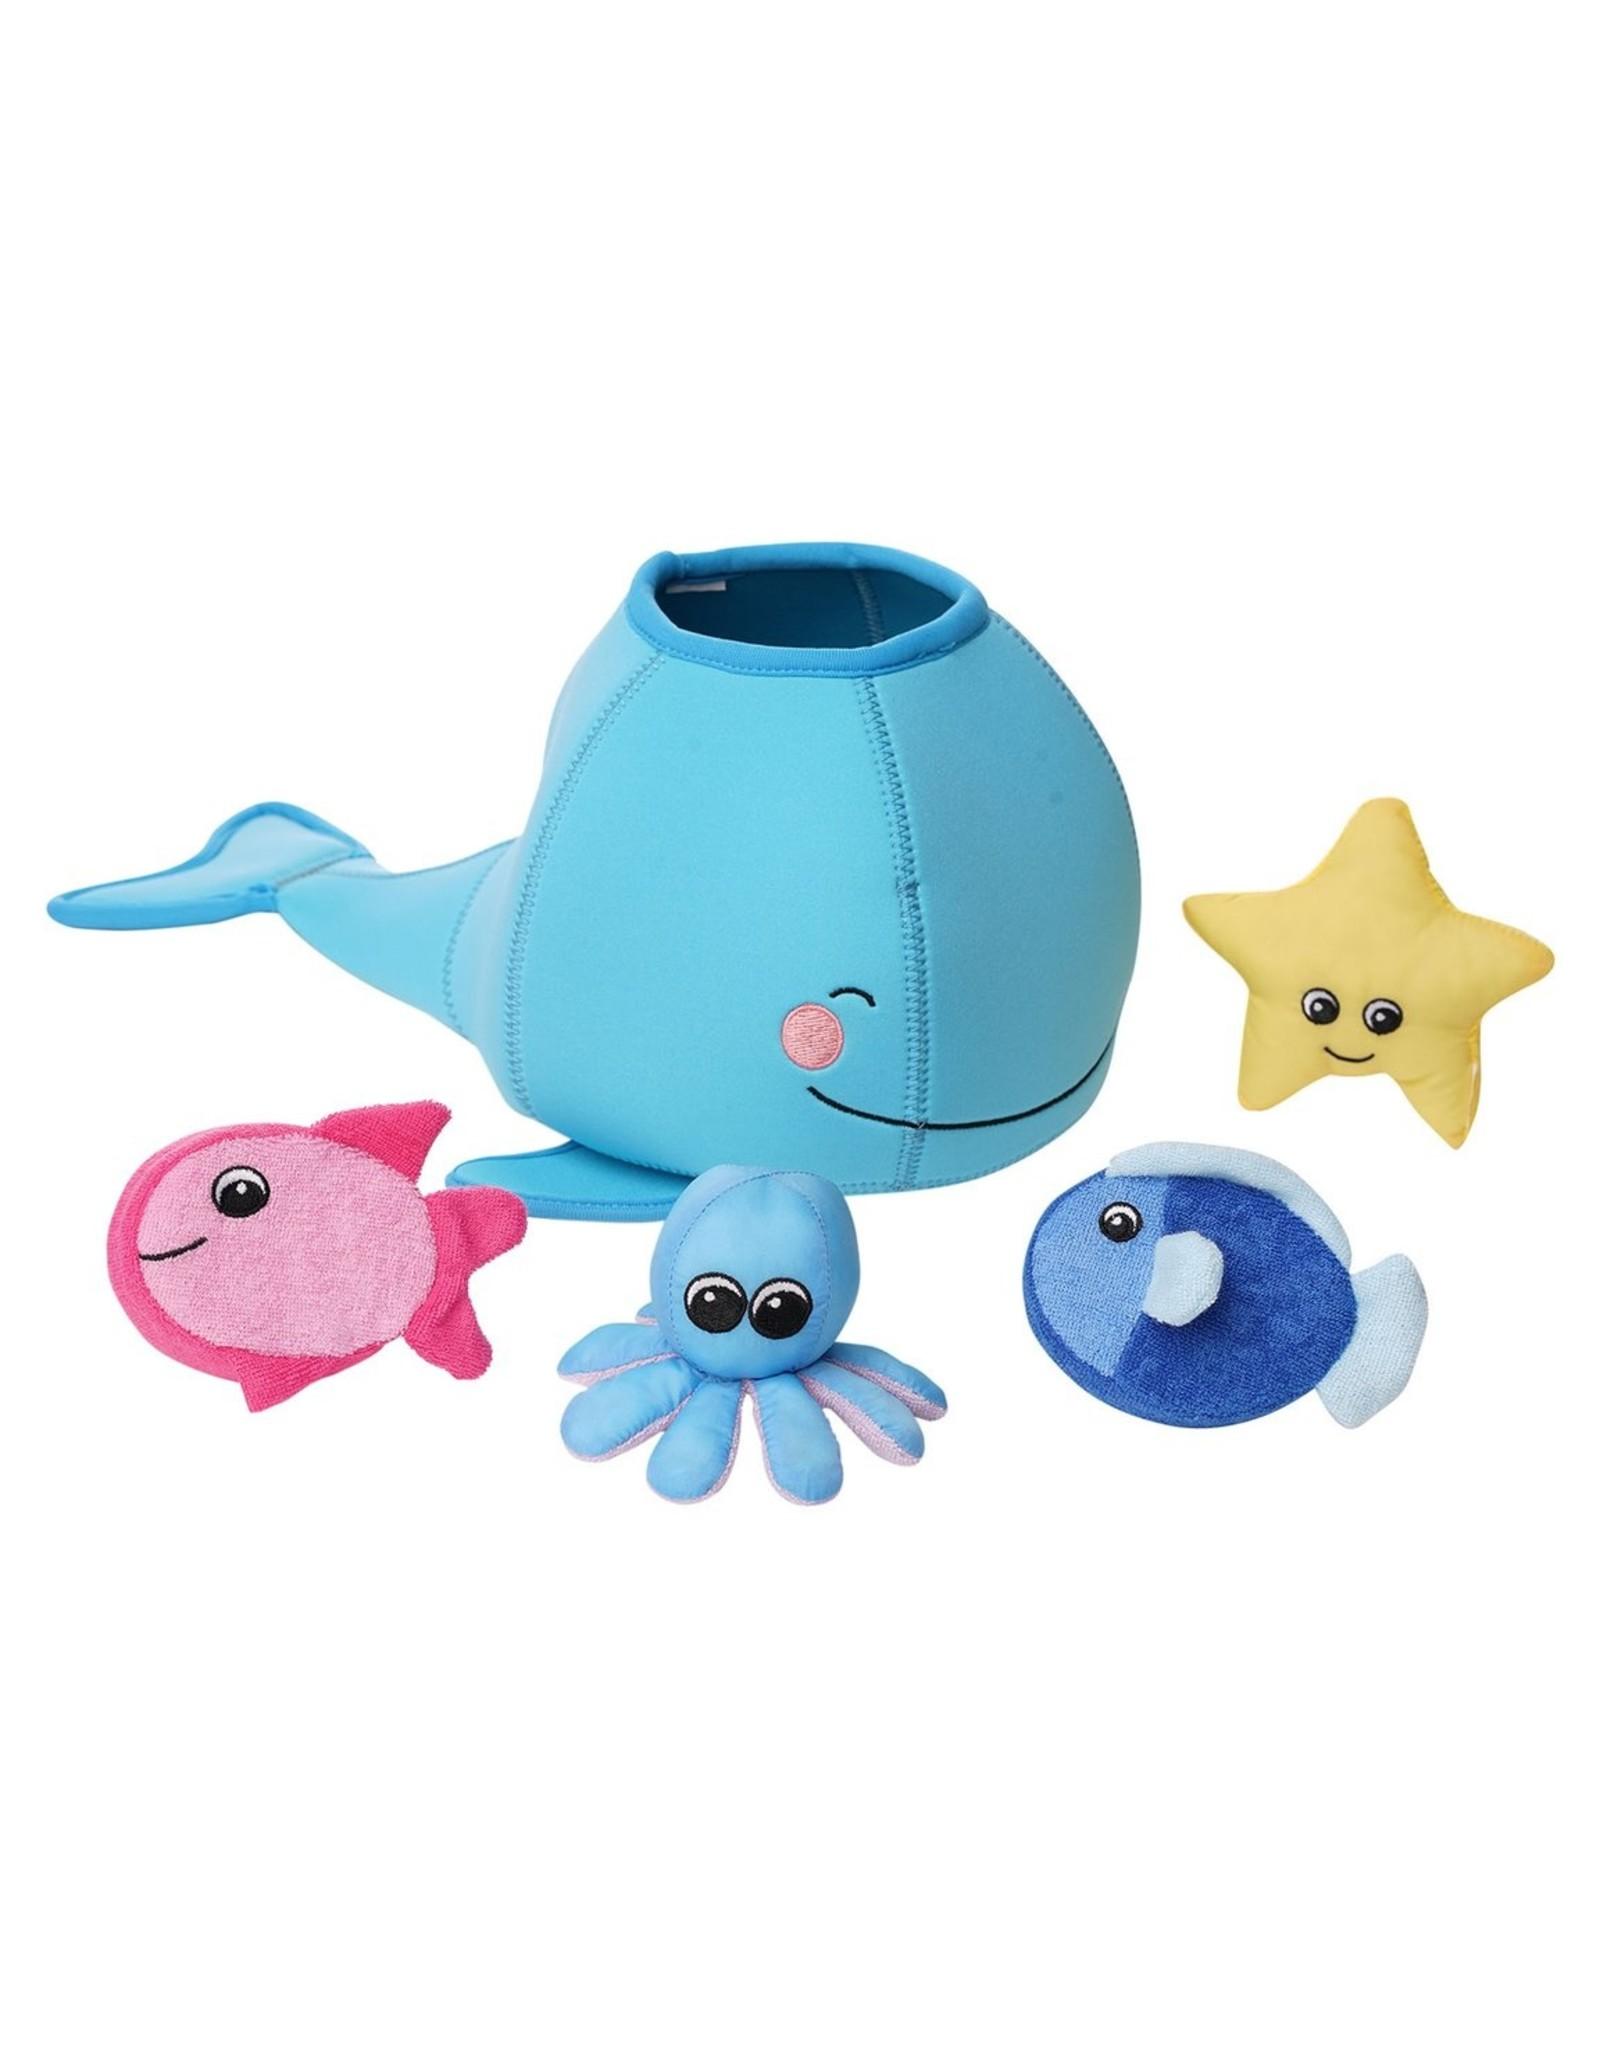 Manhattan Toy Whale Floating Fill N Spill Bath Toy